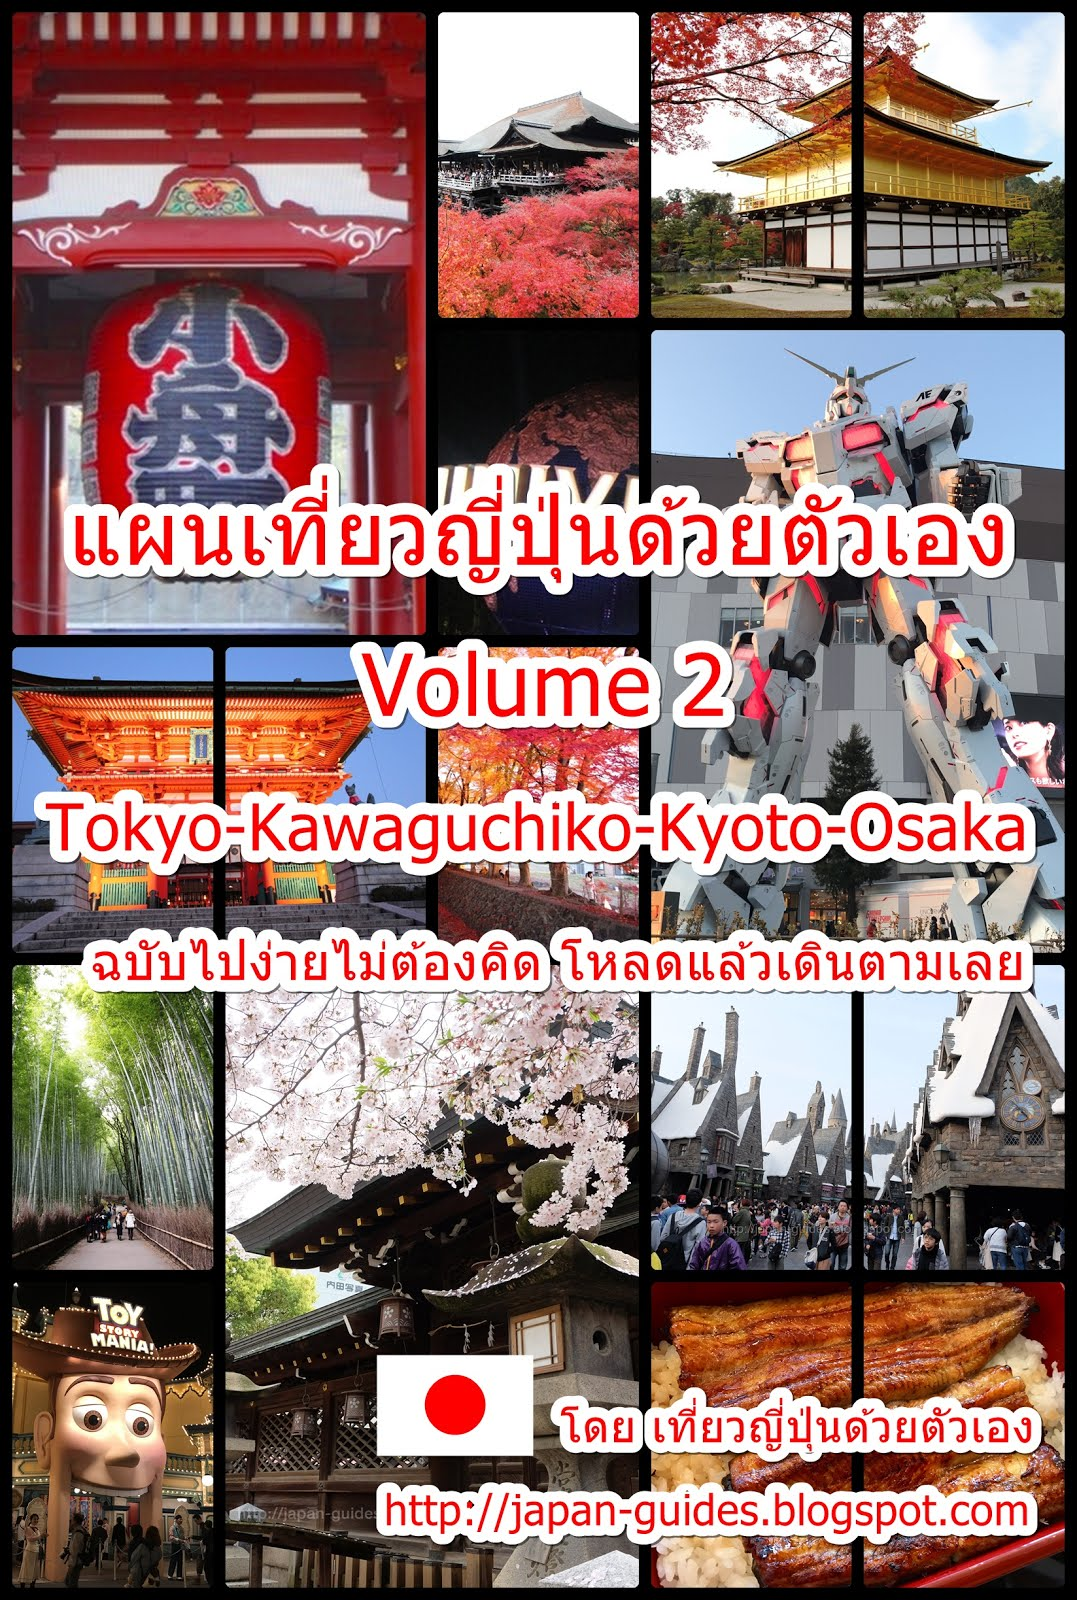 Ebook แผนเที่ยวญี่ปุ่นด้วยตัวเอง v.2